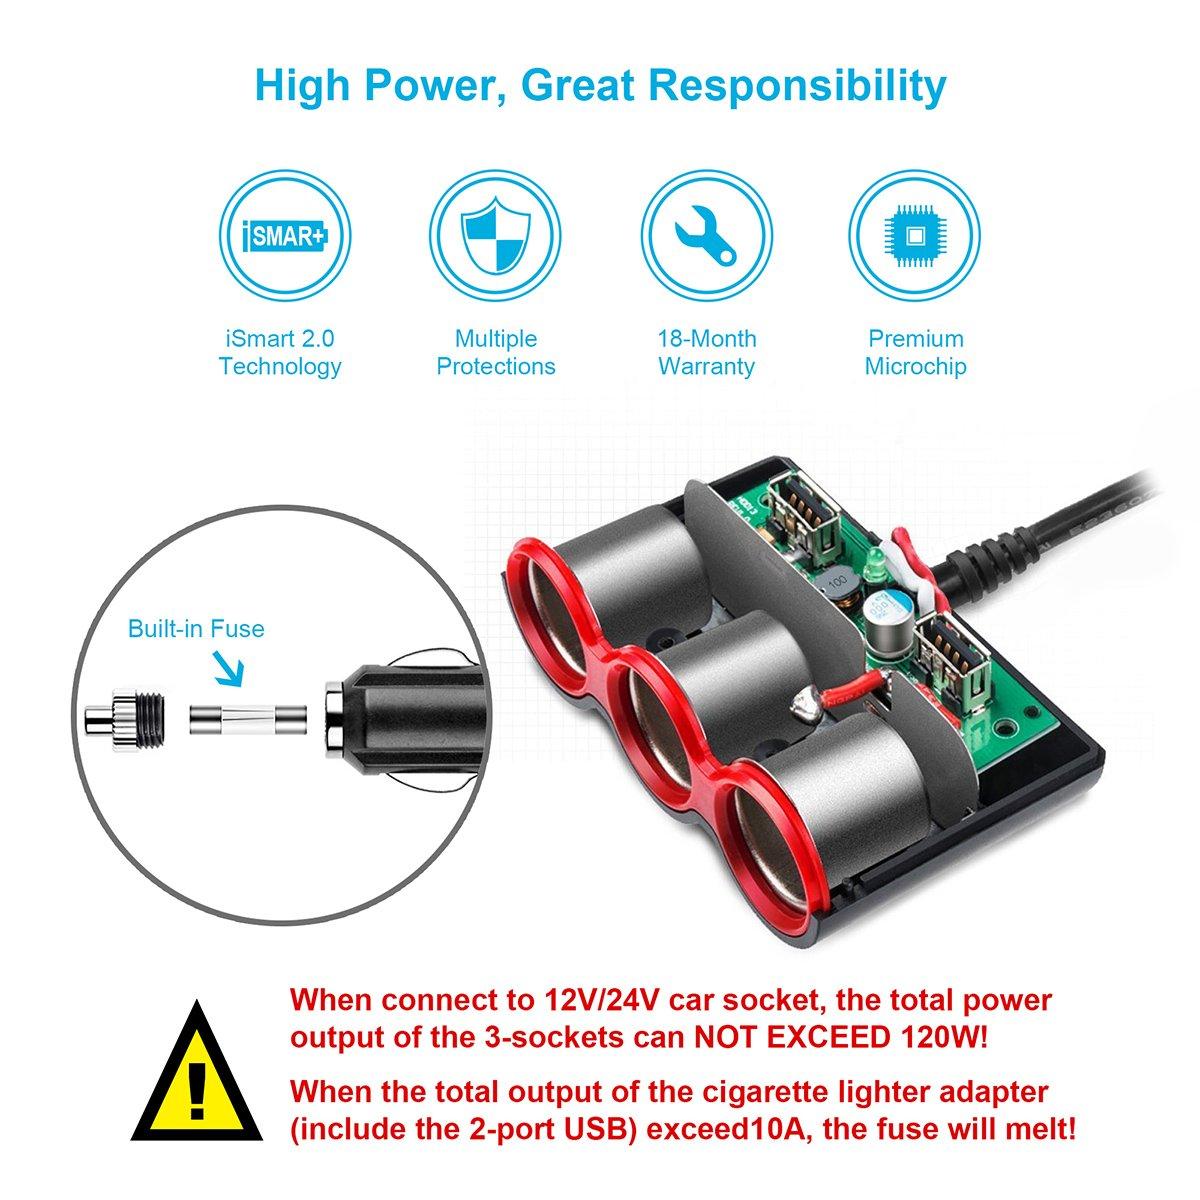 Cigarette Lighter Adapter 120w 3 Socket Car Usb Charger Circuit Design Schematic Splitter 34a Dual Dc 12v 24v Outlet Multi Functions